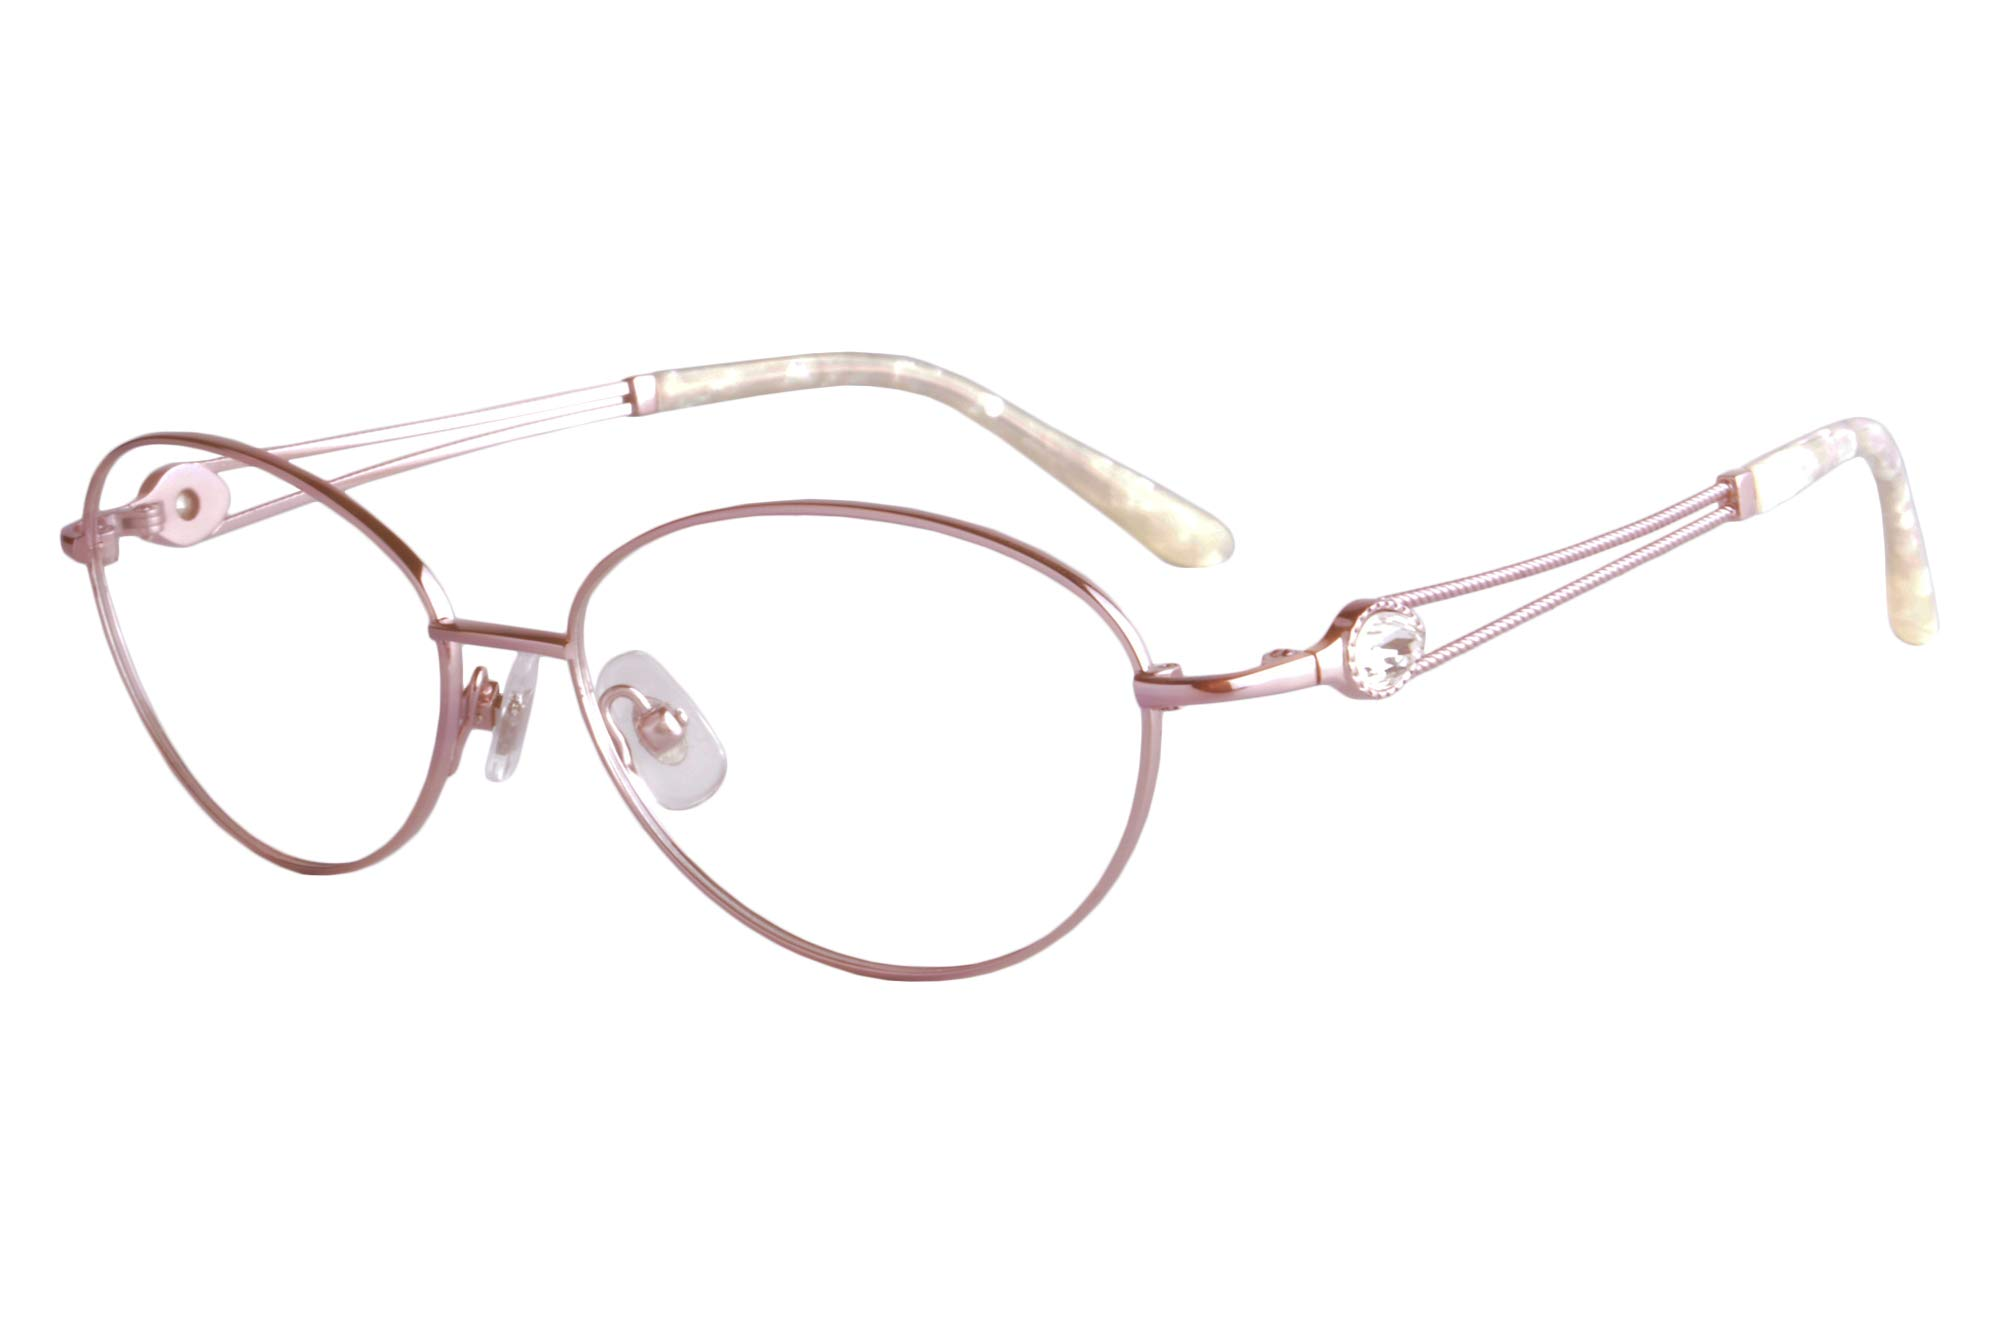 SHINU Womens Ultra Light Titanium Frame Blue Light Blocking Computer Myopia Glasses for Shortsighted Eyes-FA966(pink frame, anti-blue lens -1.00 power)